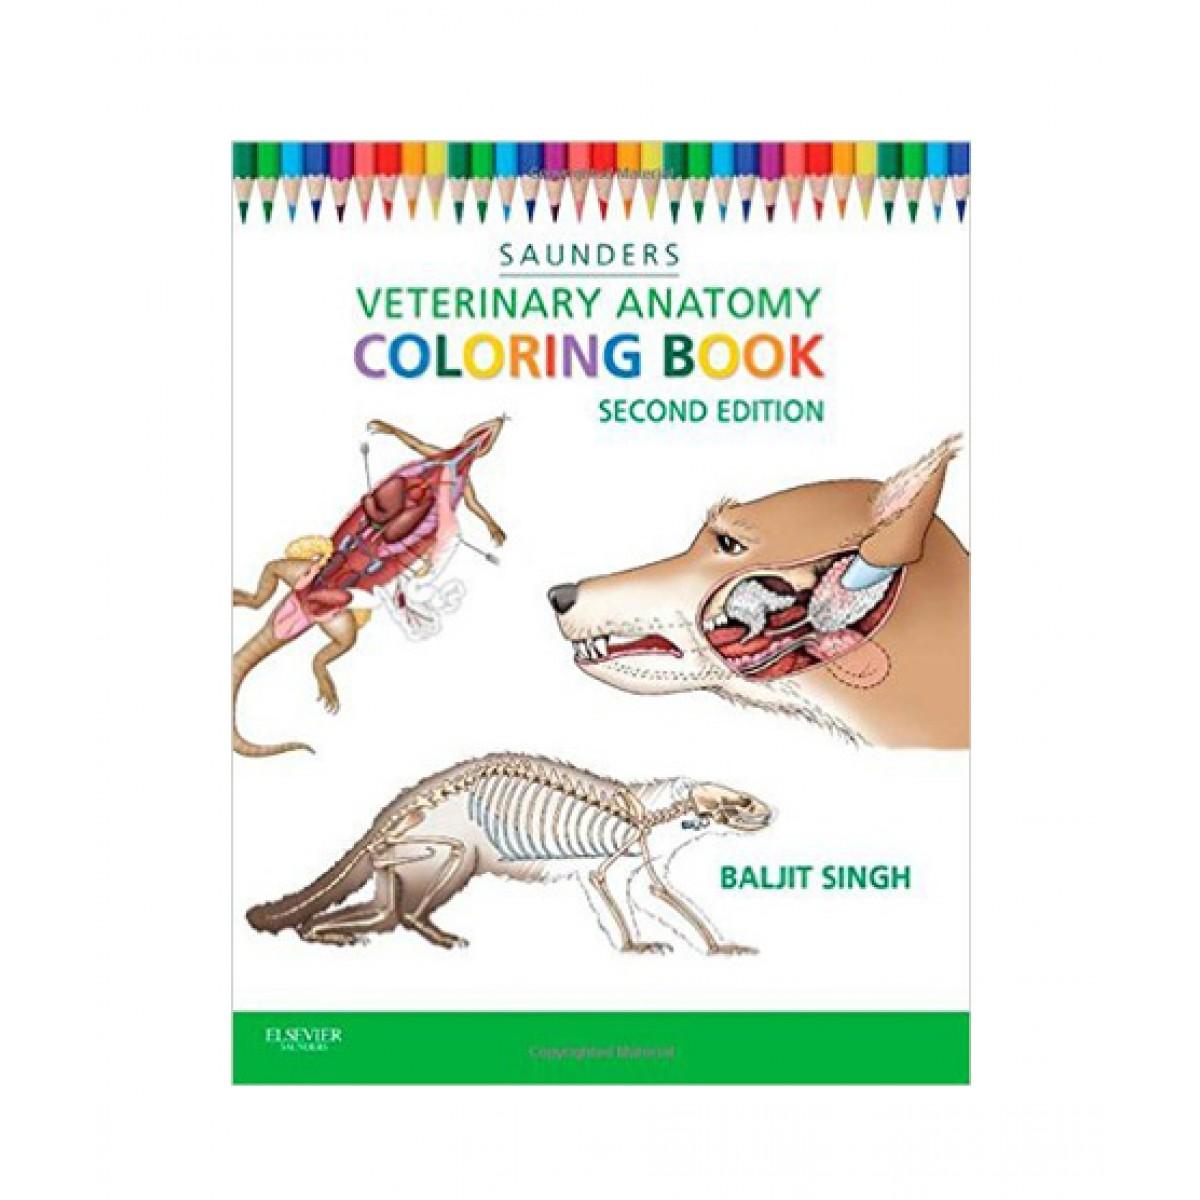 97 Anatomy Coloring Book Reviews Free